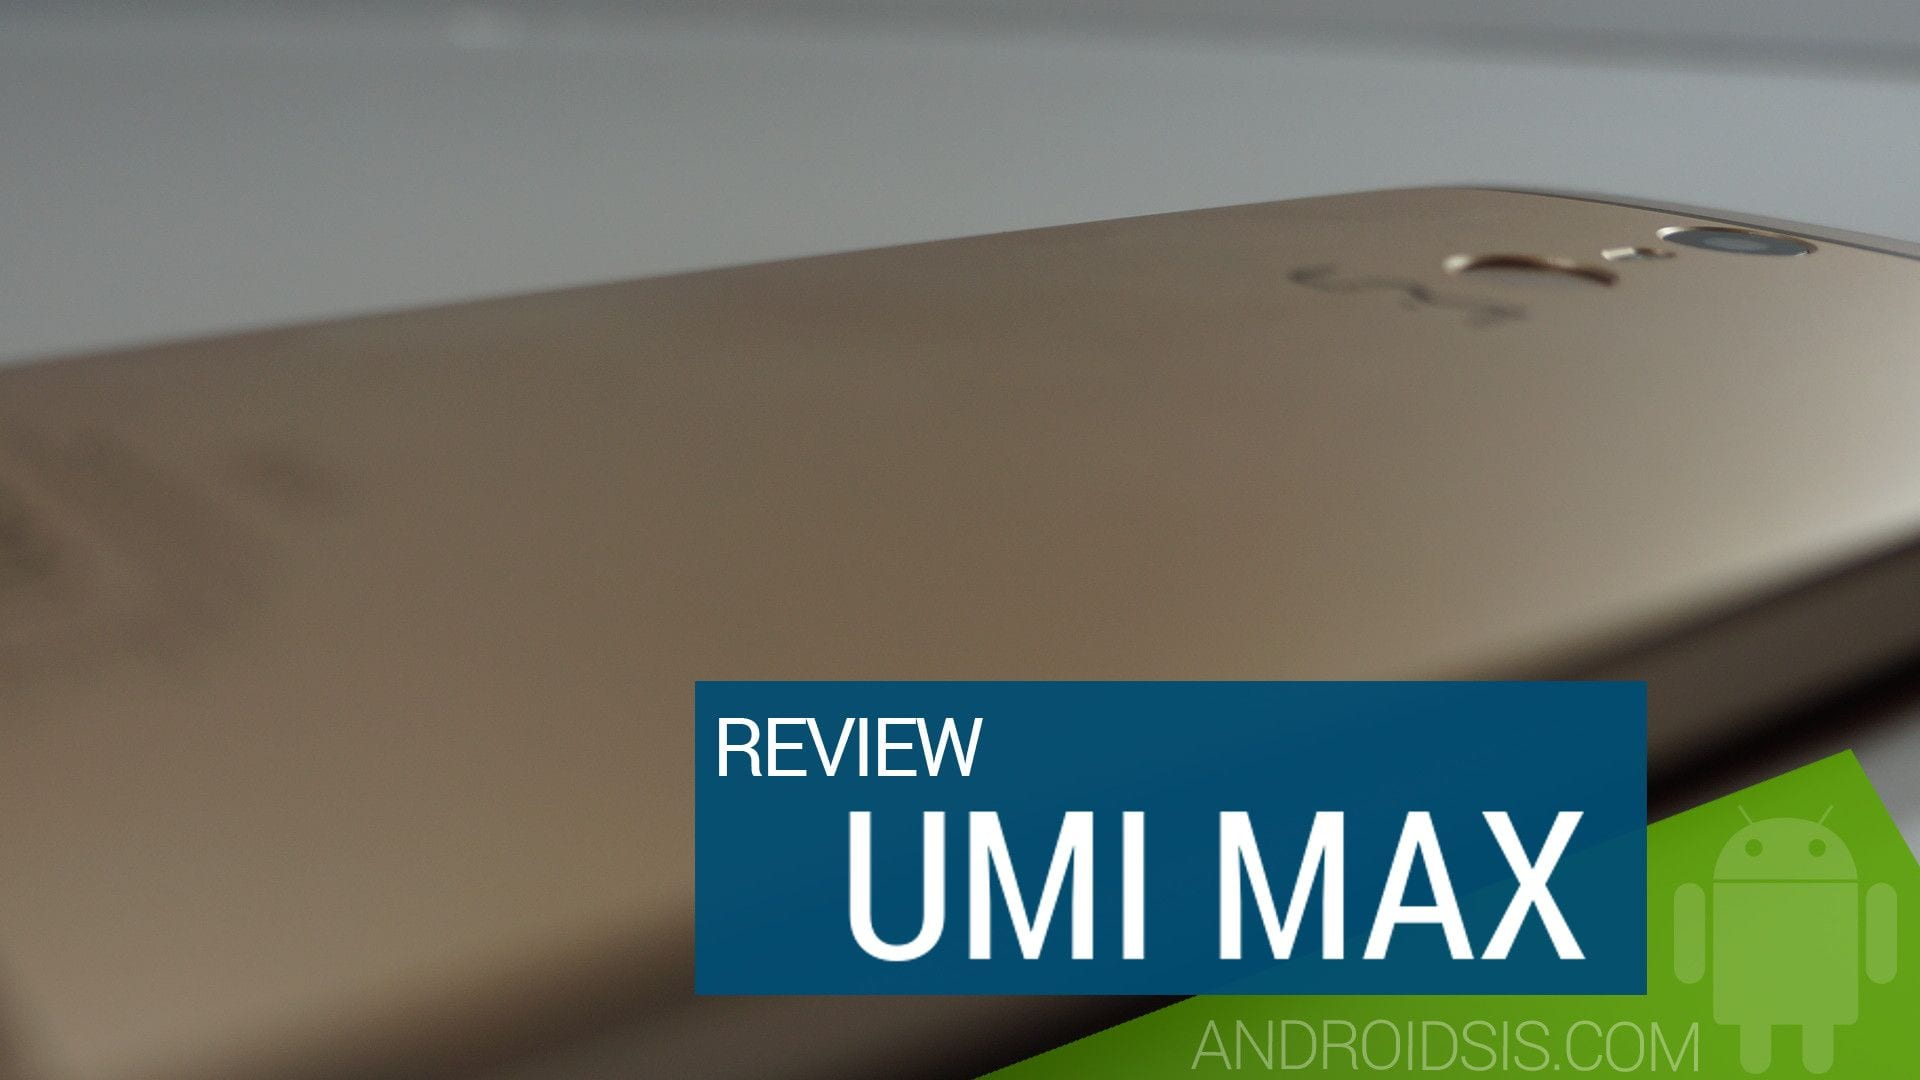 Review UMI MAX